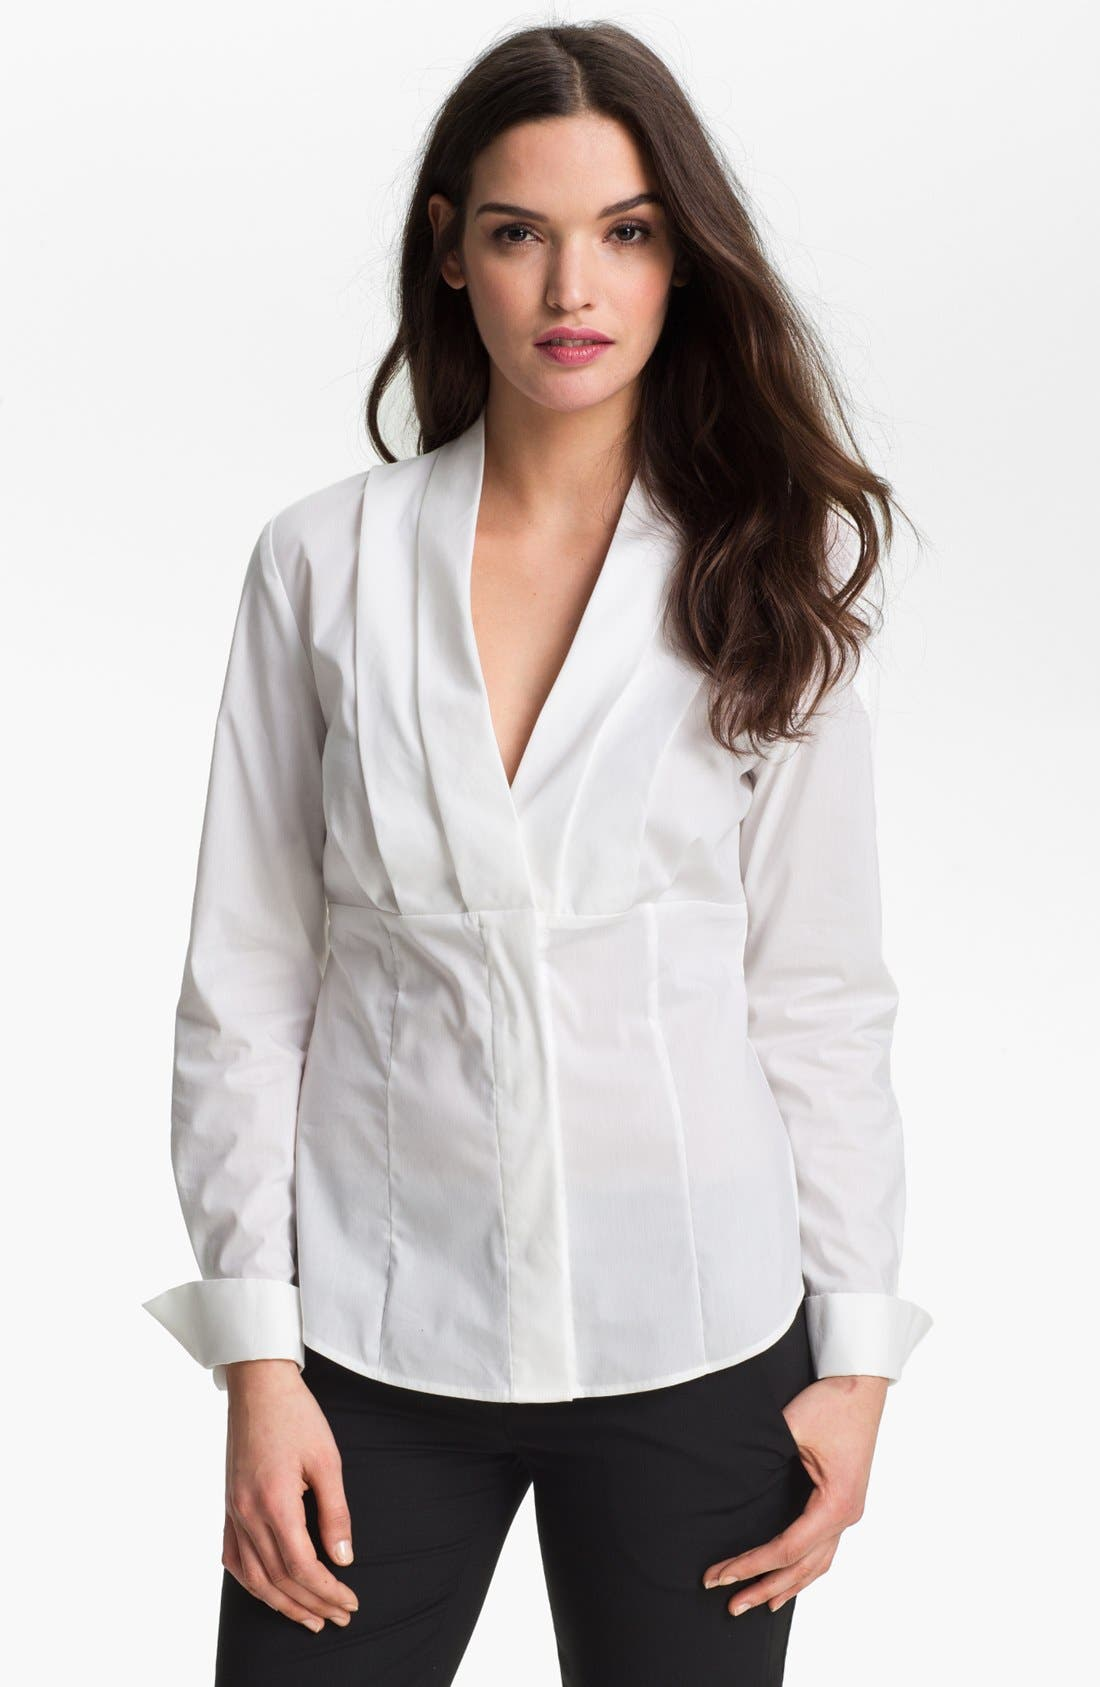 Alternate Image 1 Selected - Anne Klein Pleated V-Neck Shirt (Petite)